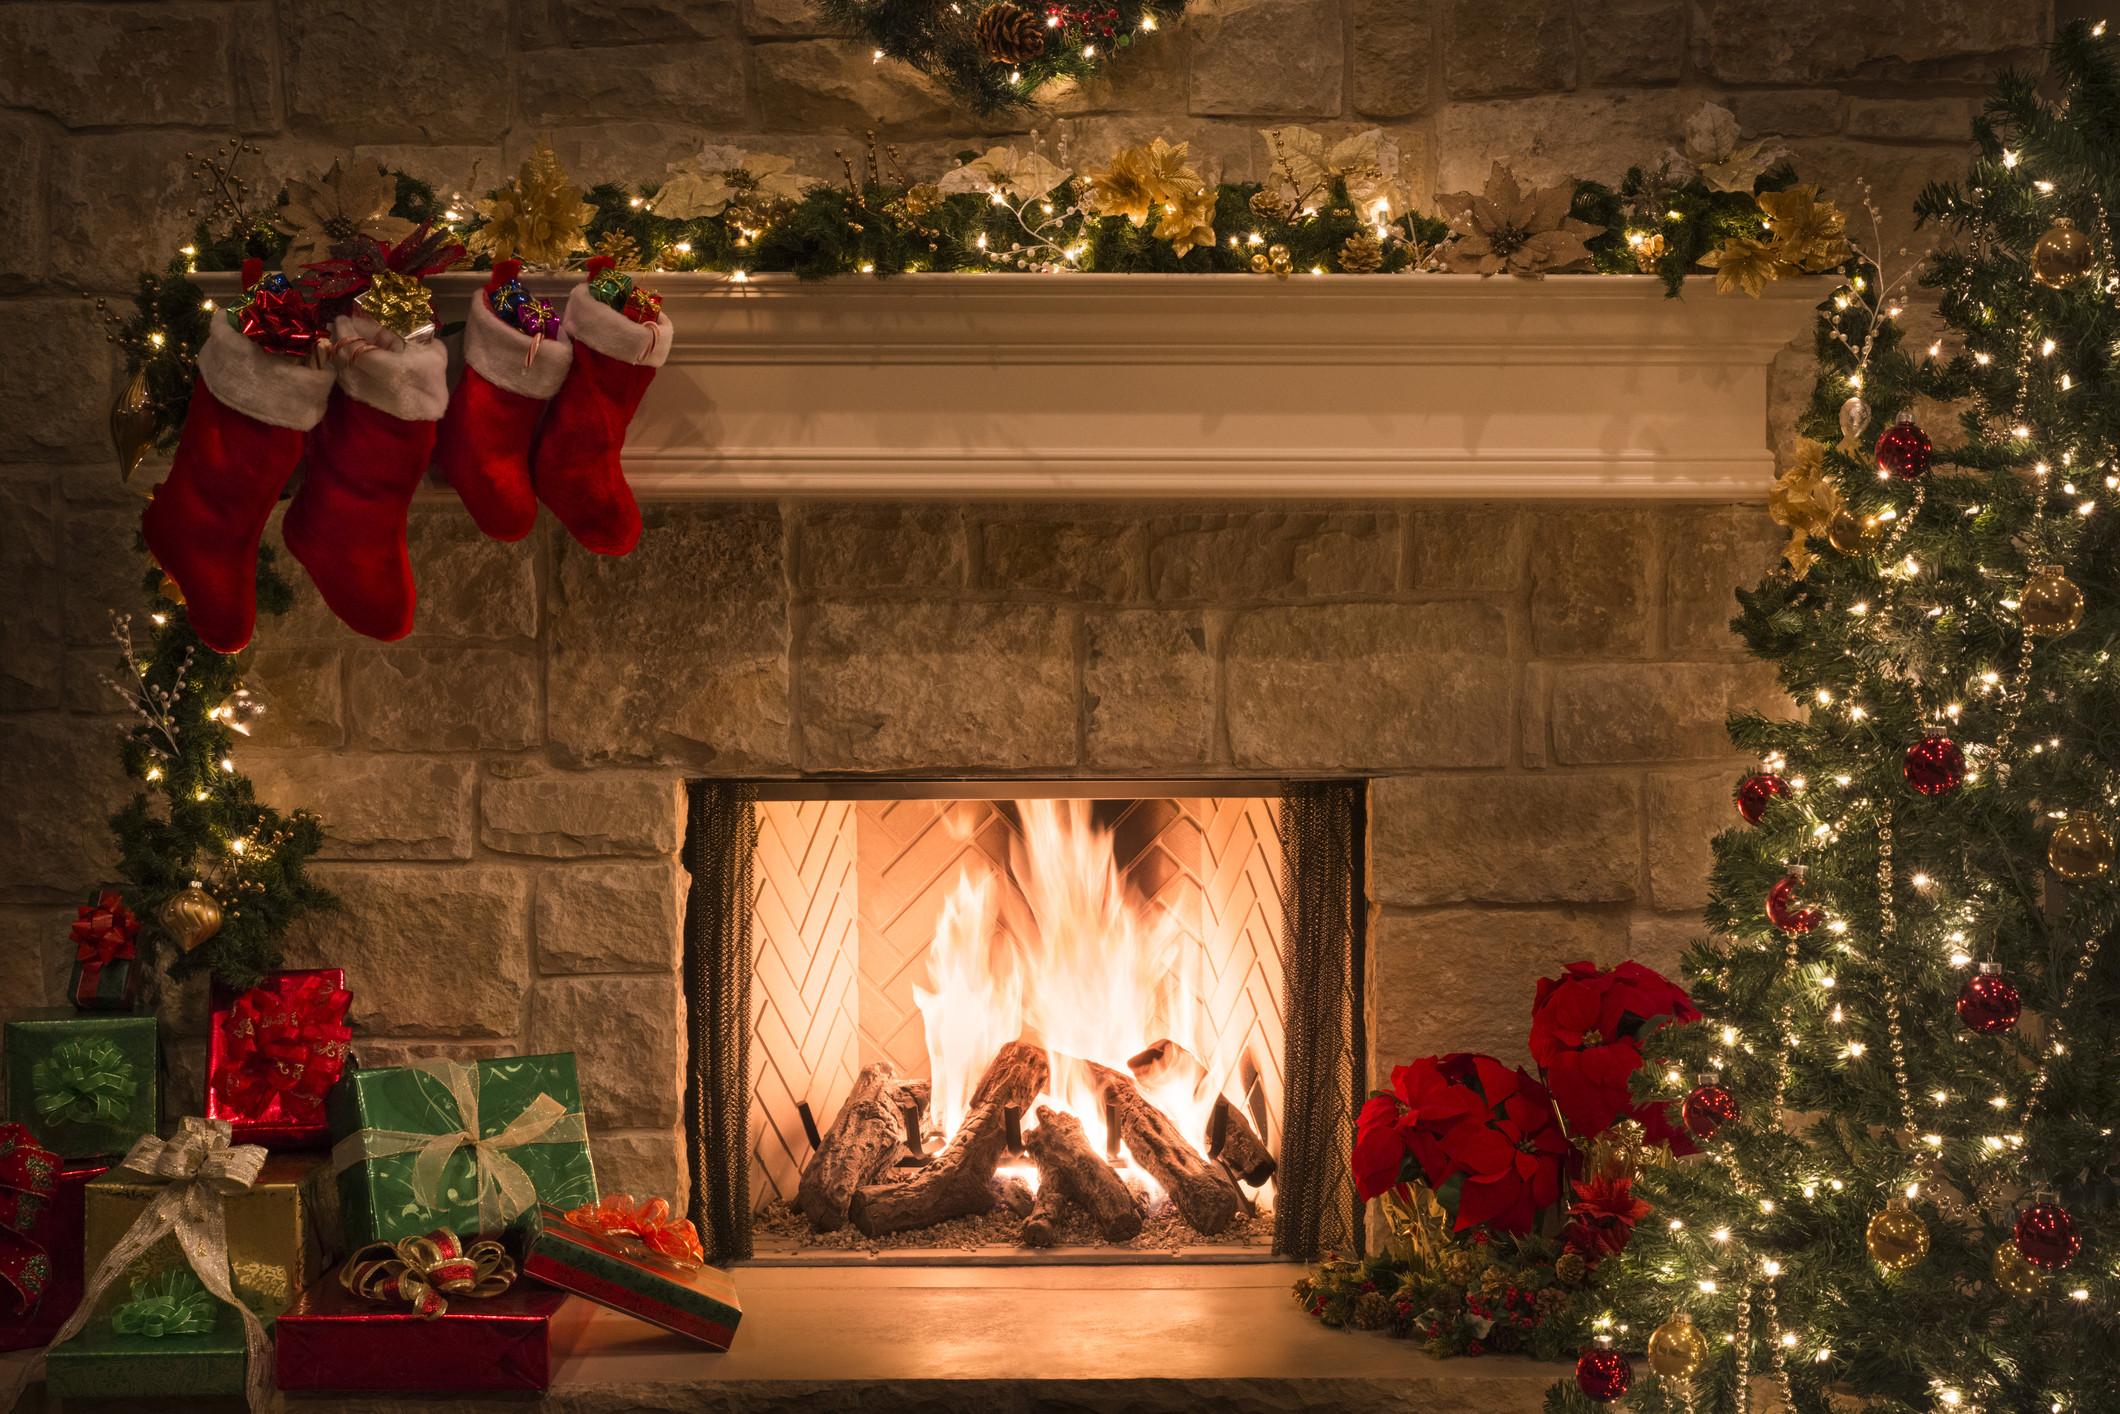 Christmas Tree Fireplace  Christmas fireplace stockings ts tree copy space